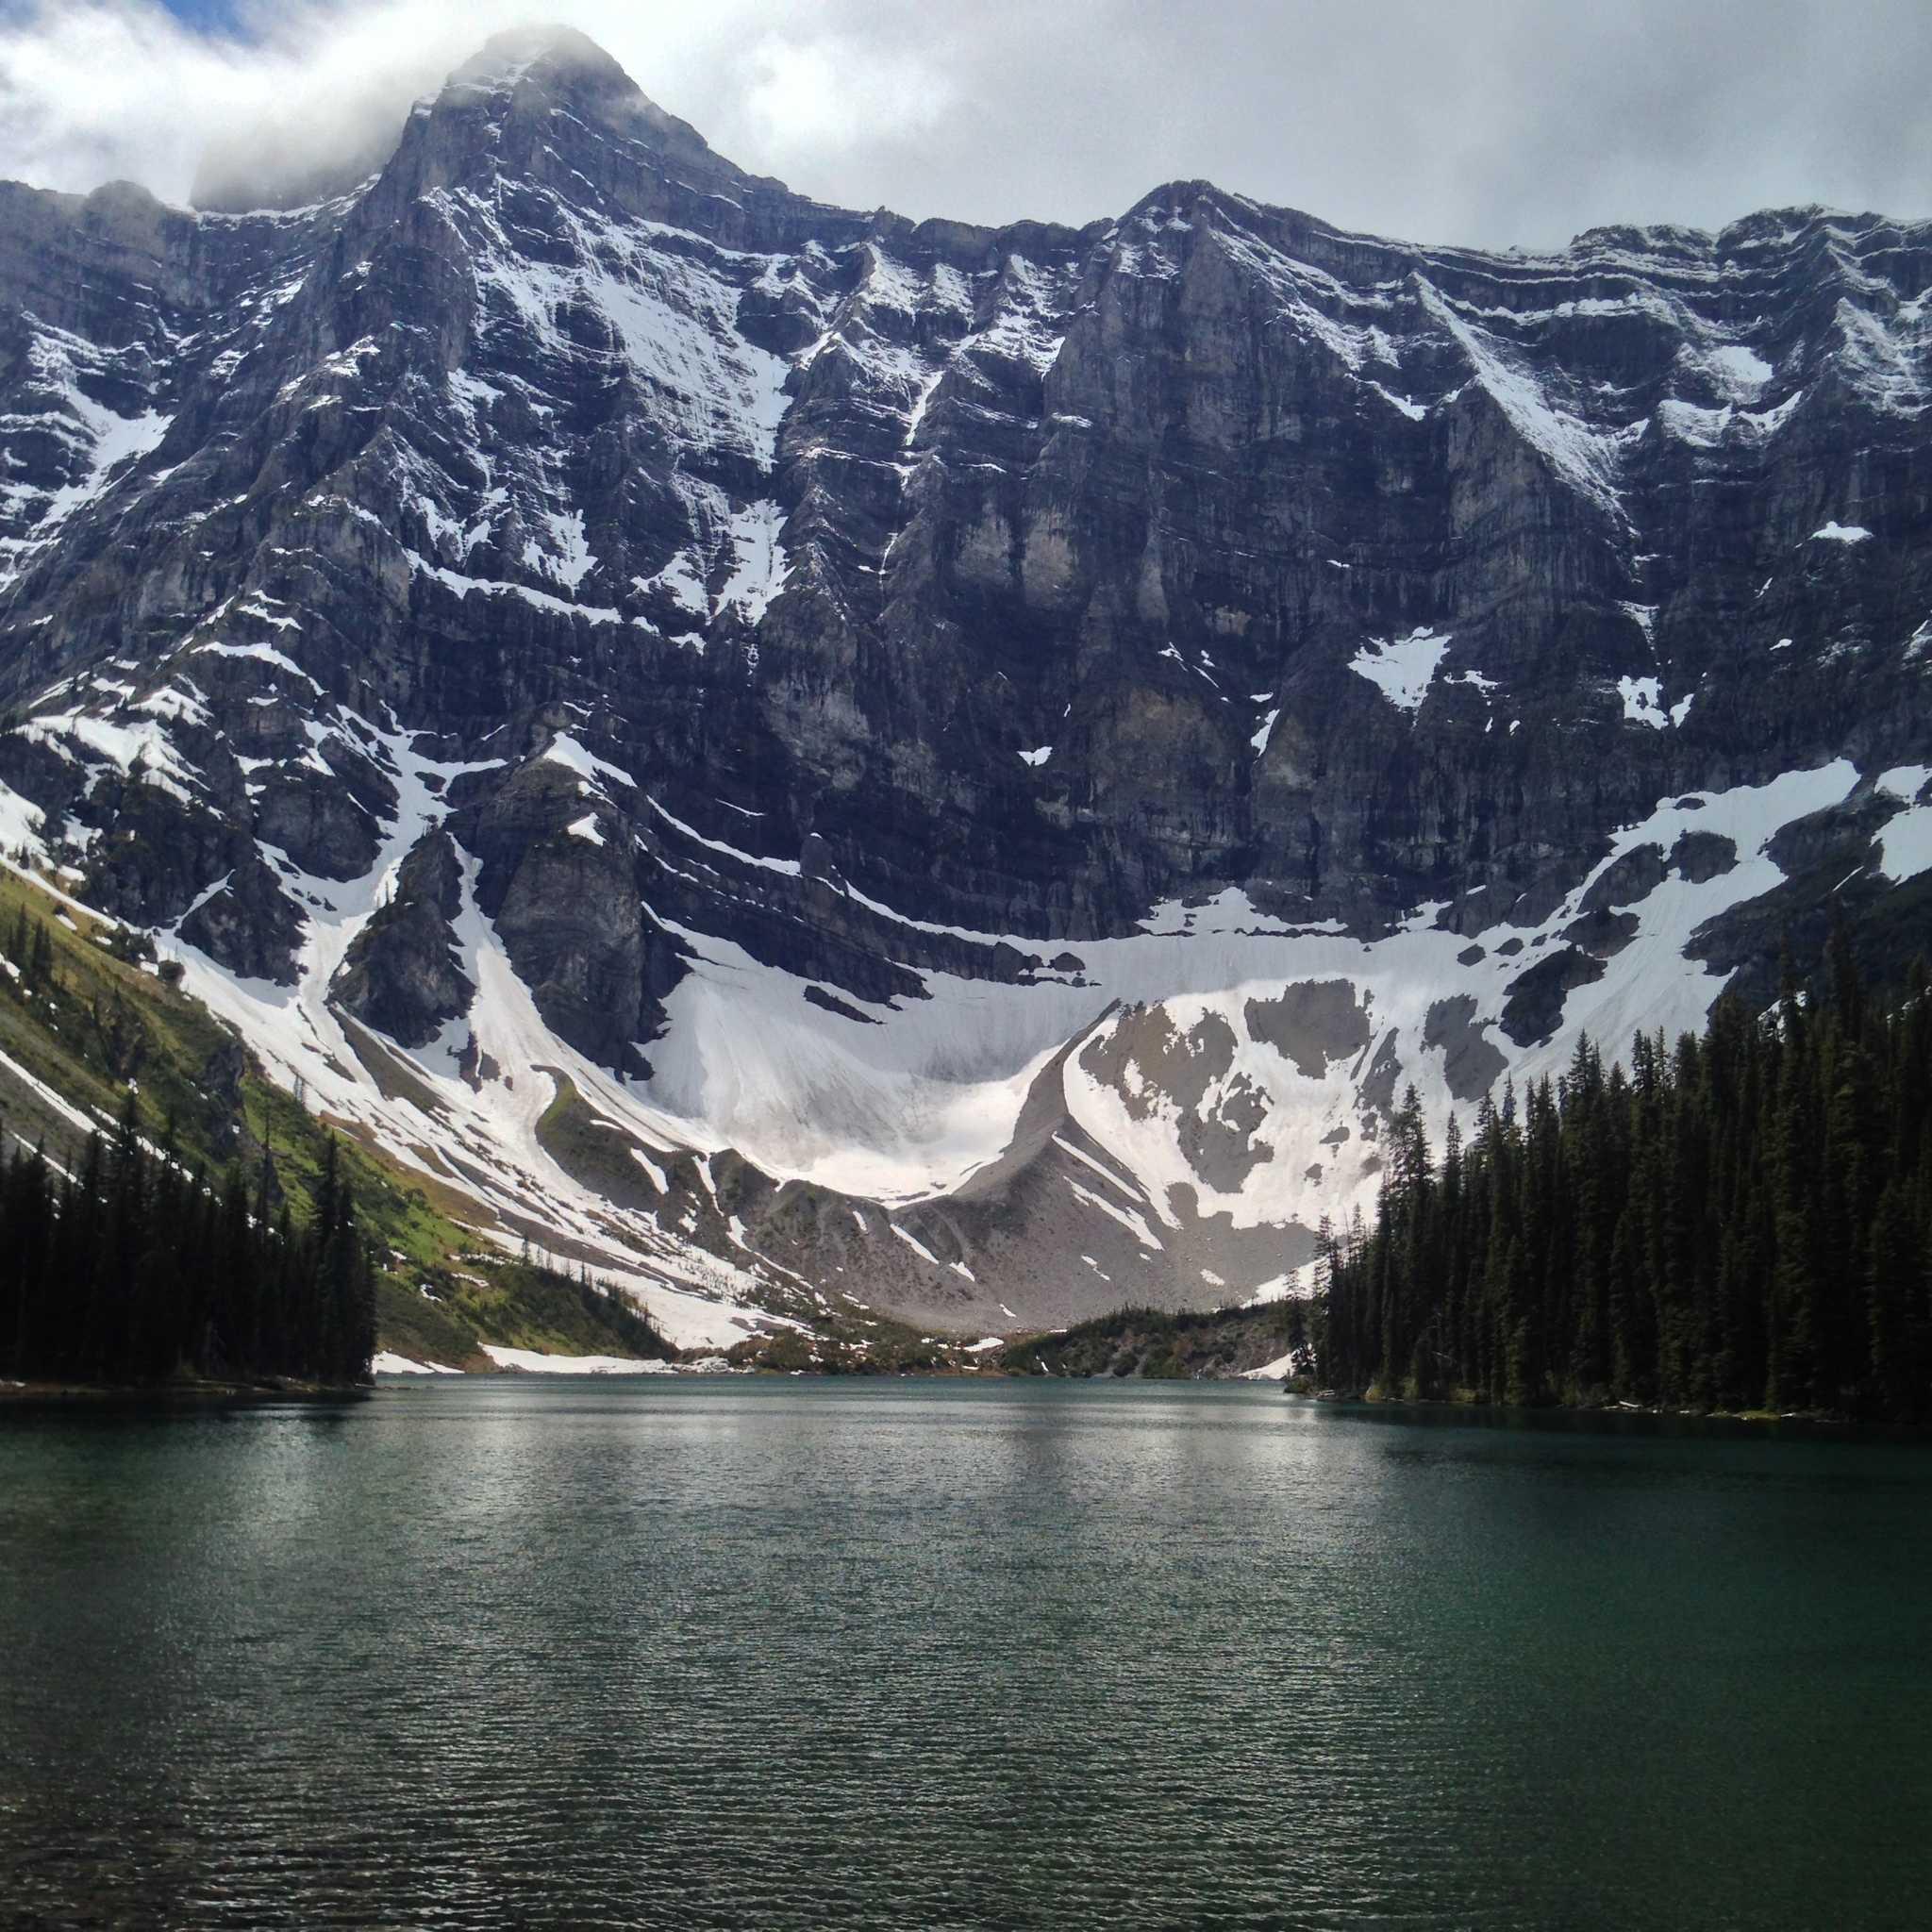 Mount Sarrail looms over Rawson Lake